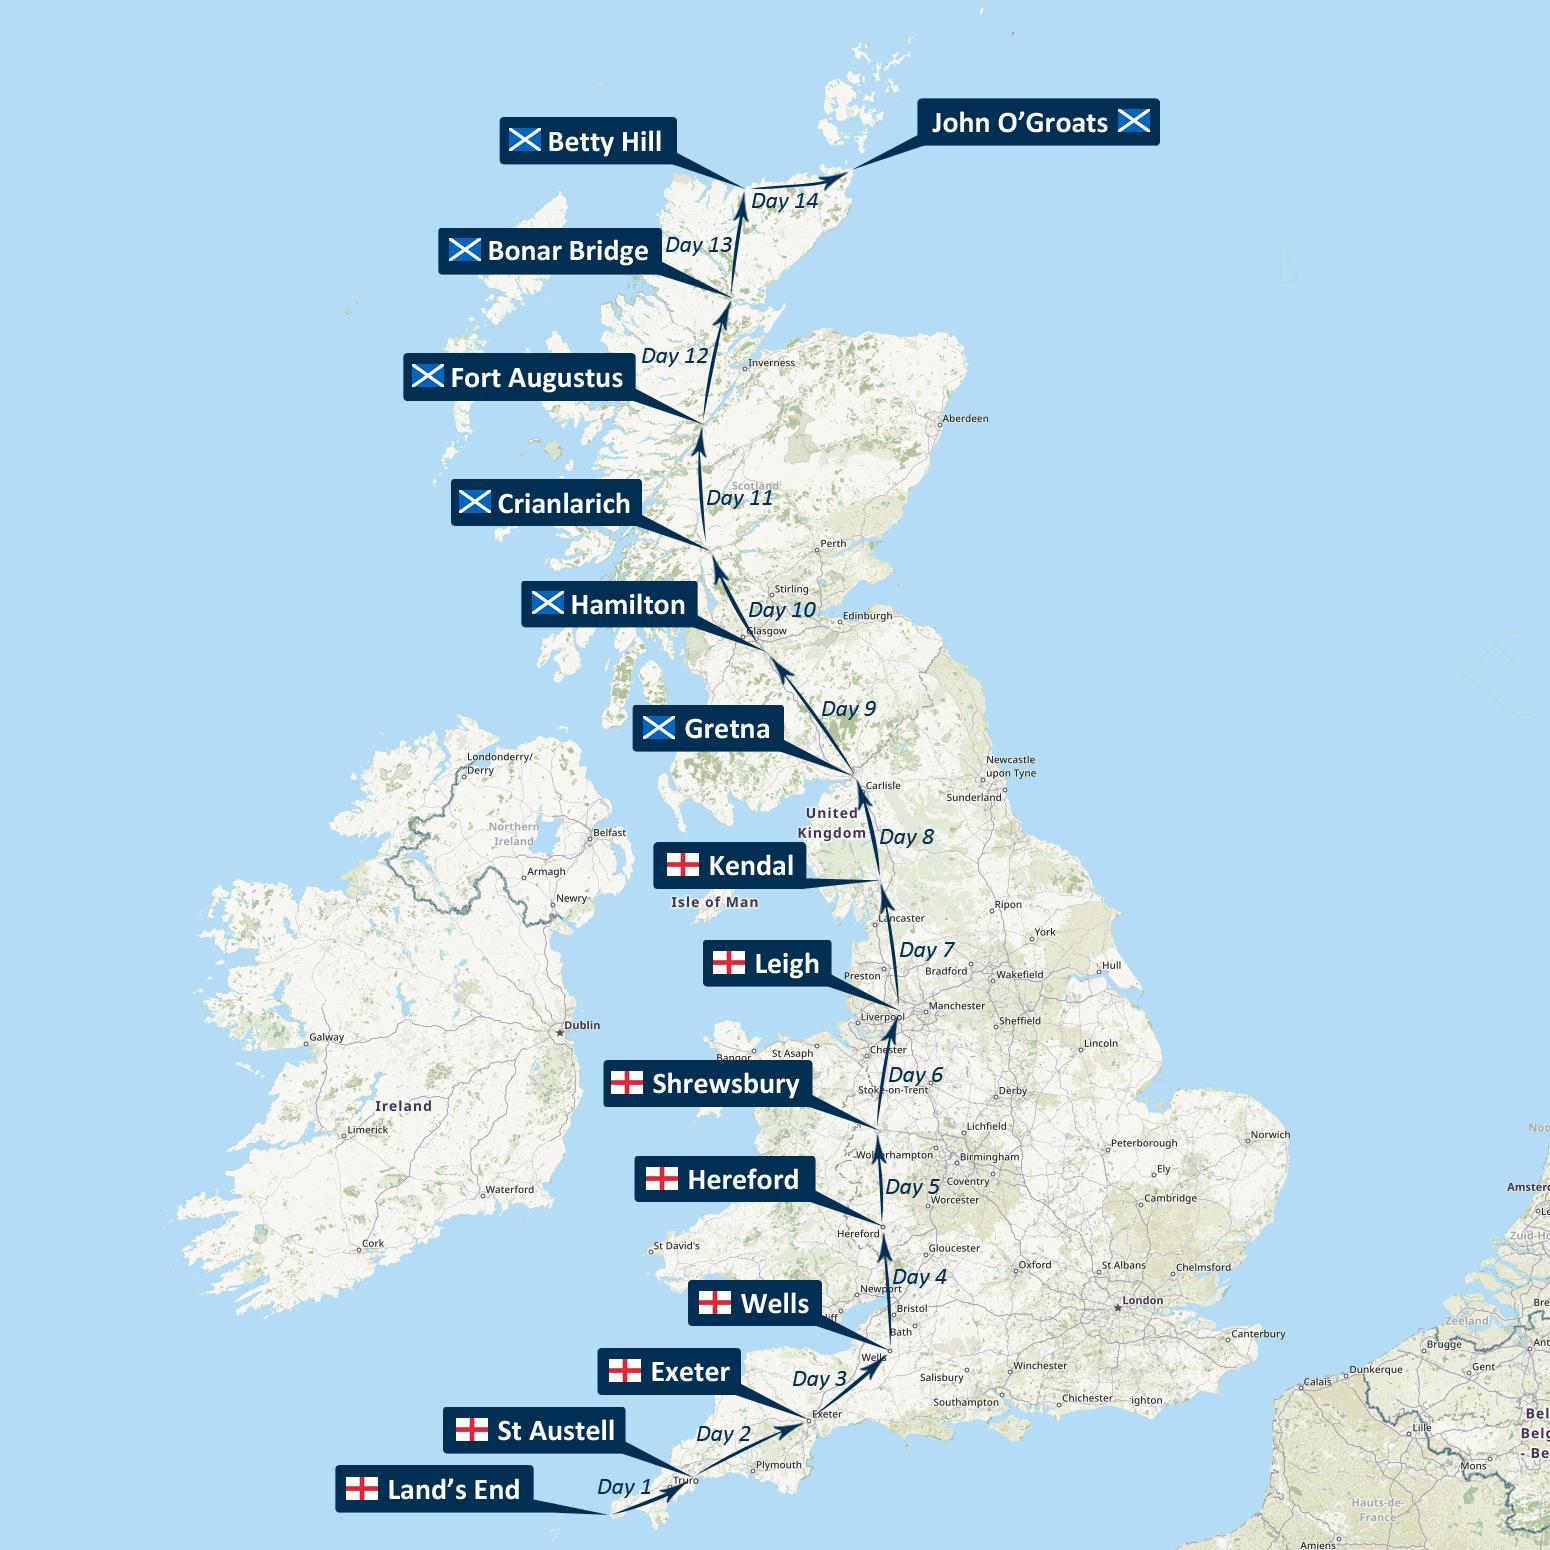 Land's End to John o'Groats Cycle Tour